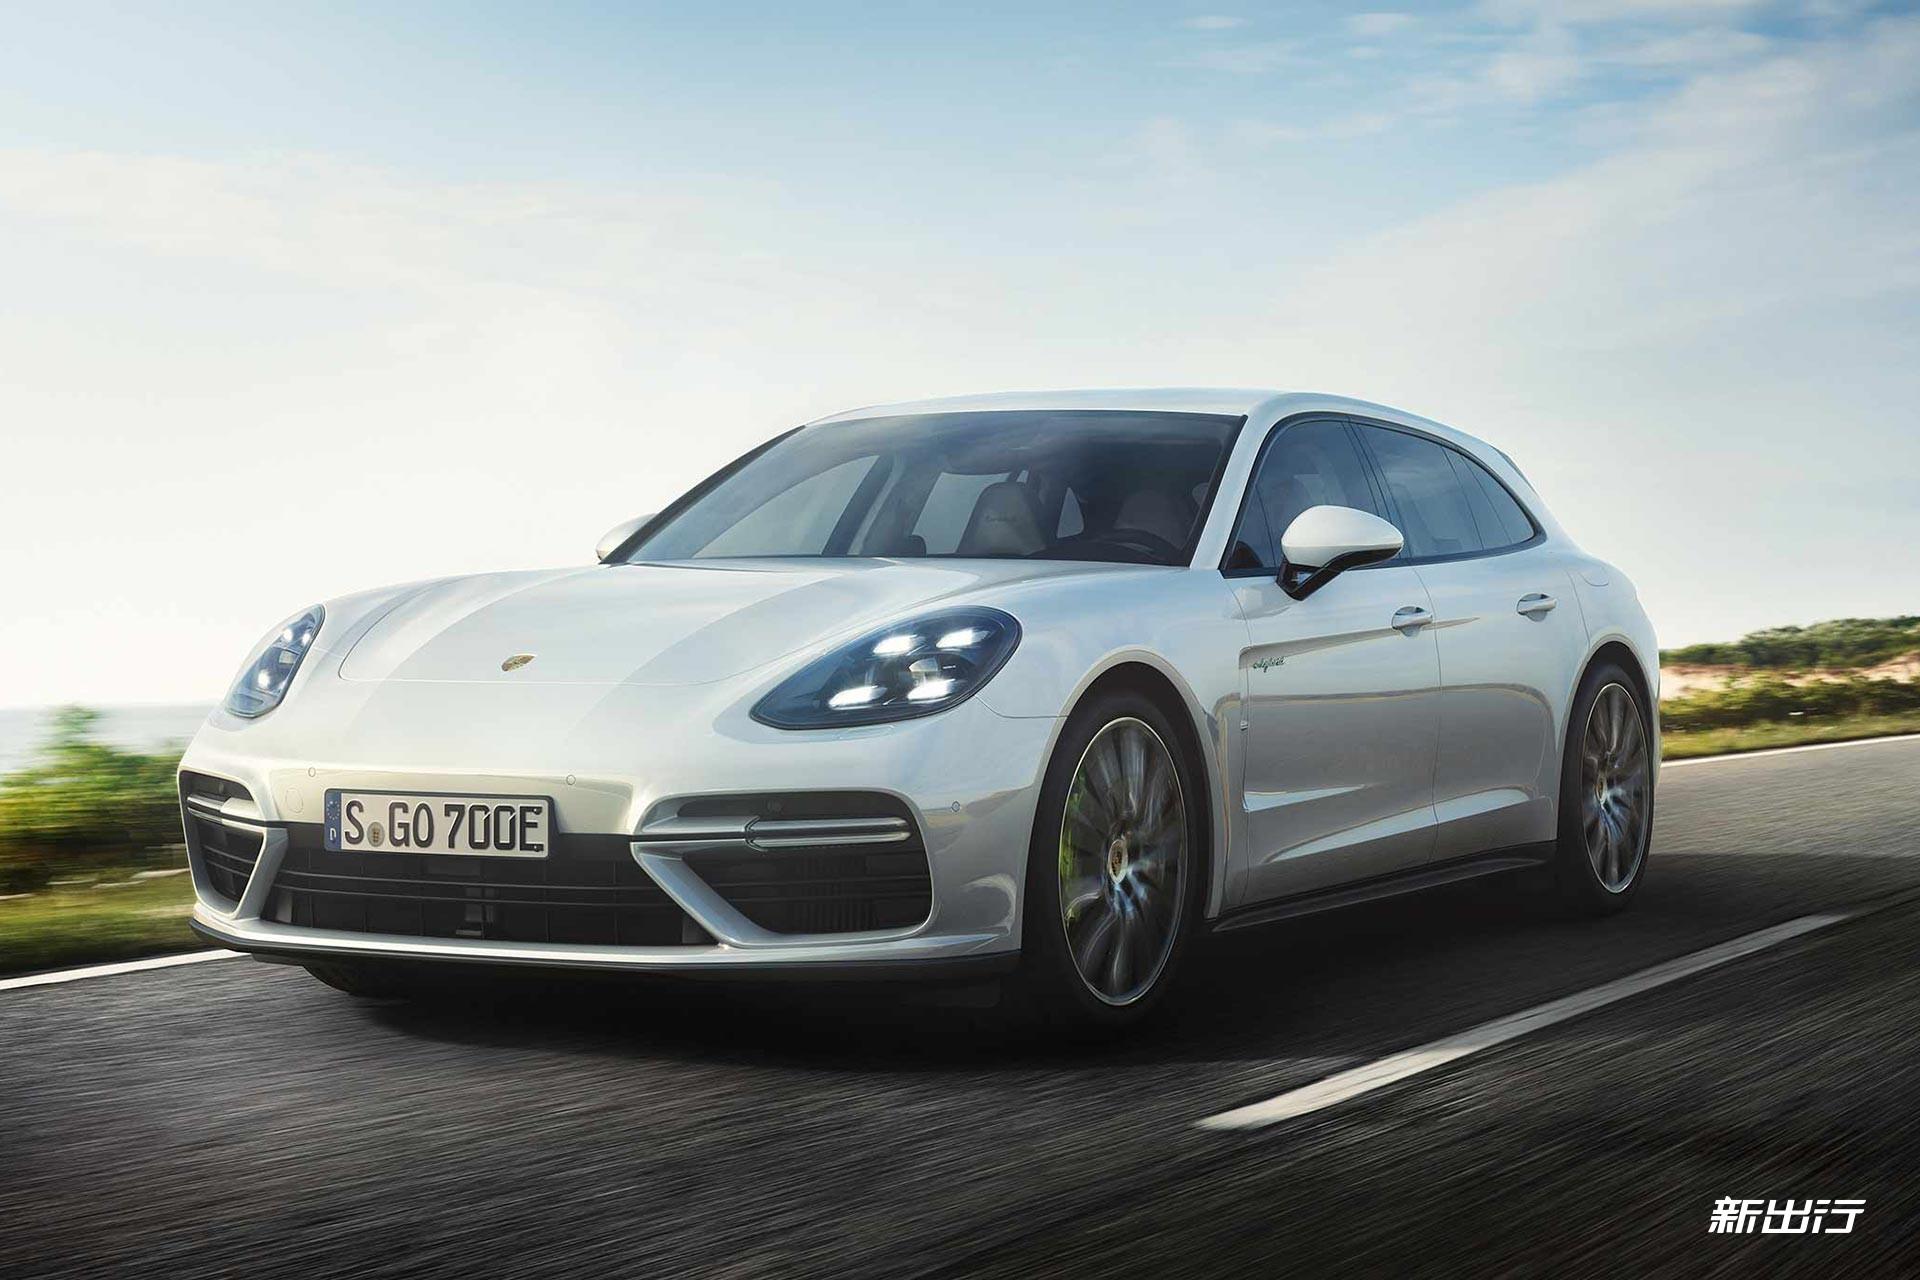 2018-Porsche-Panamera-Turbo-S-E-Hybrid-Sport-Turismo-front-three-quarter.jpg